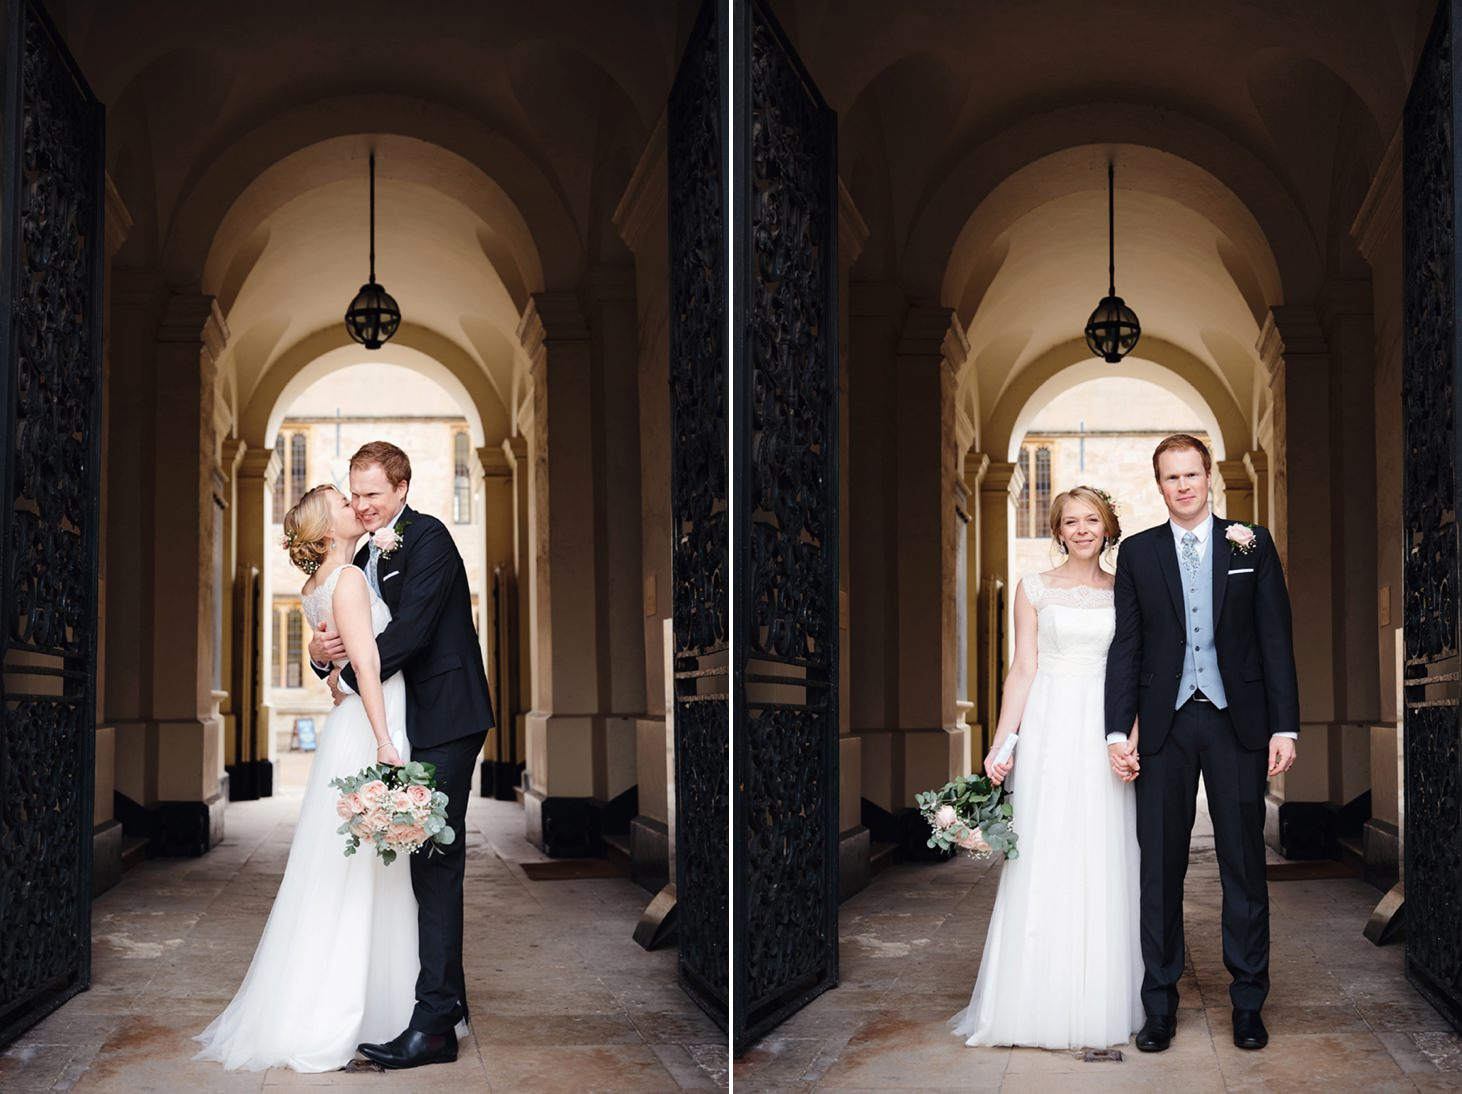 Bodleian library wedding bride and groom in doorway